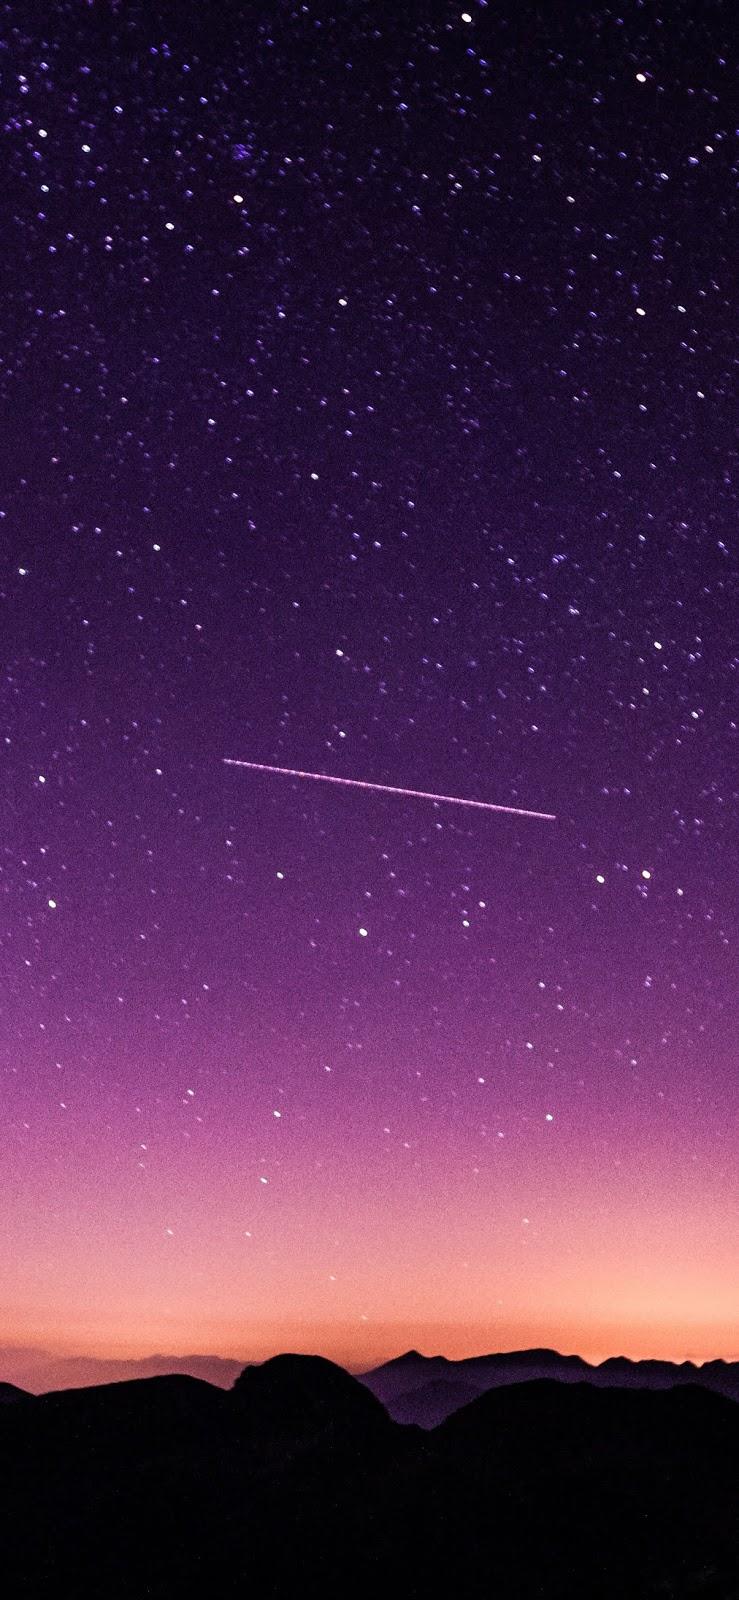 Purple starry night